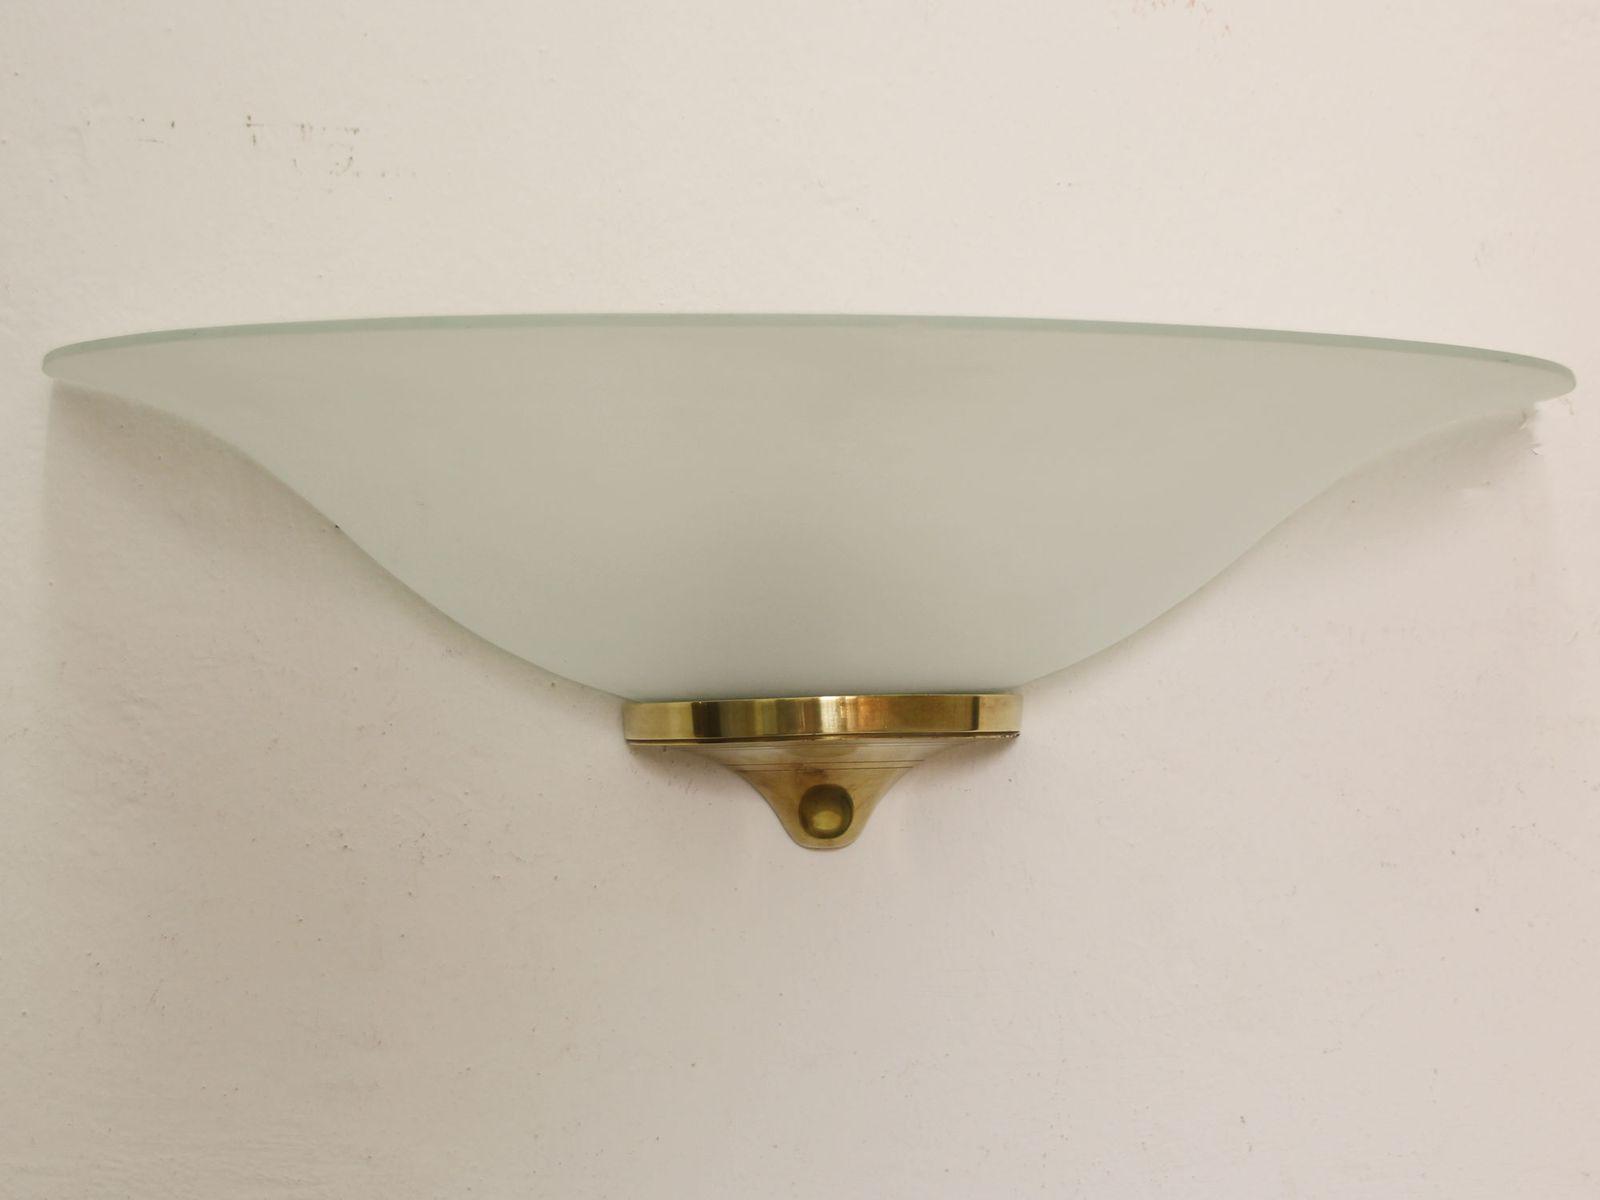 Große Moderne Französische Art Deco Wandlampe, 1930er